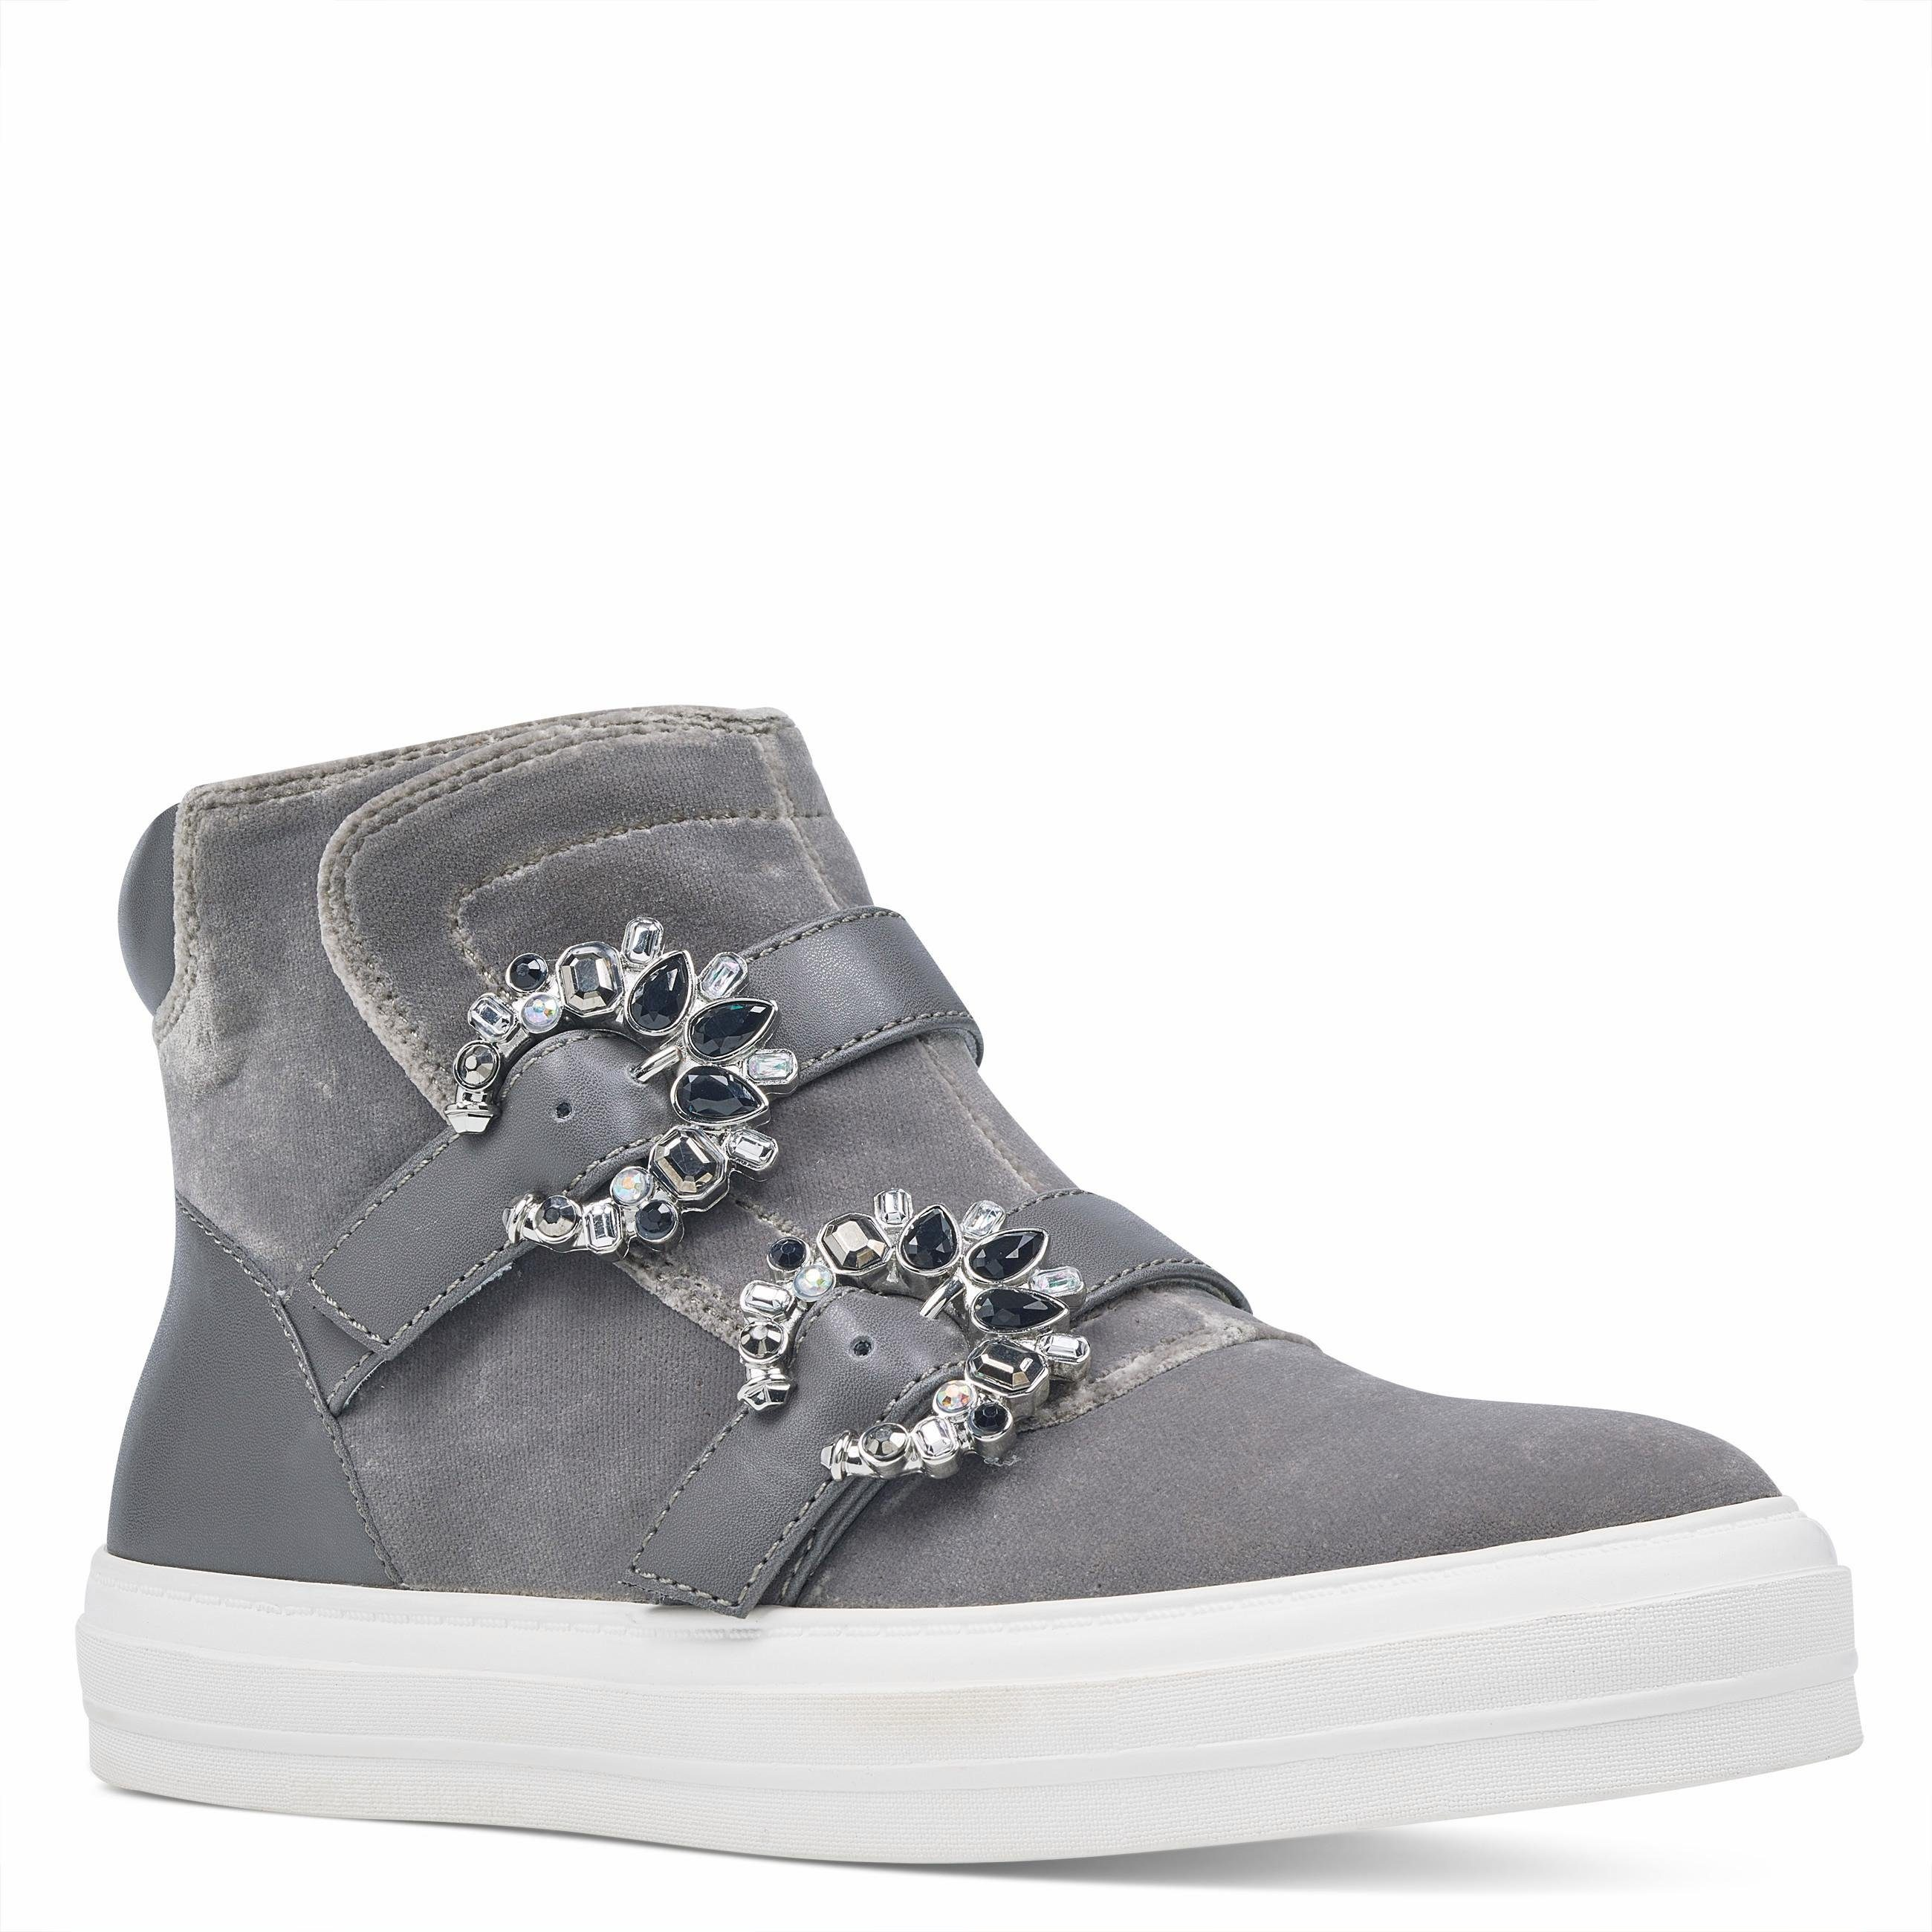 Nine West Sneaker, mit geschmückten Zierschnallen  grau